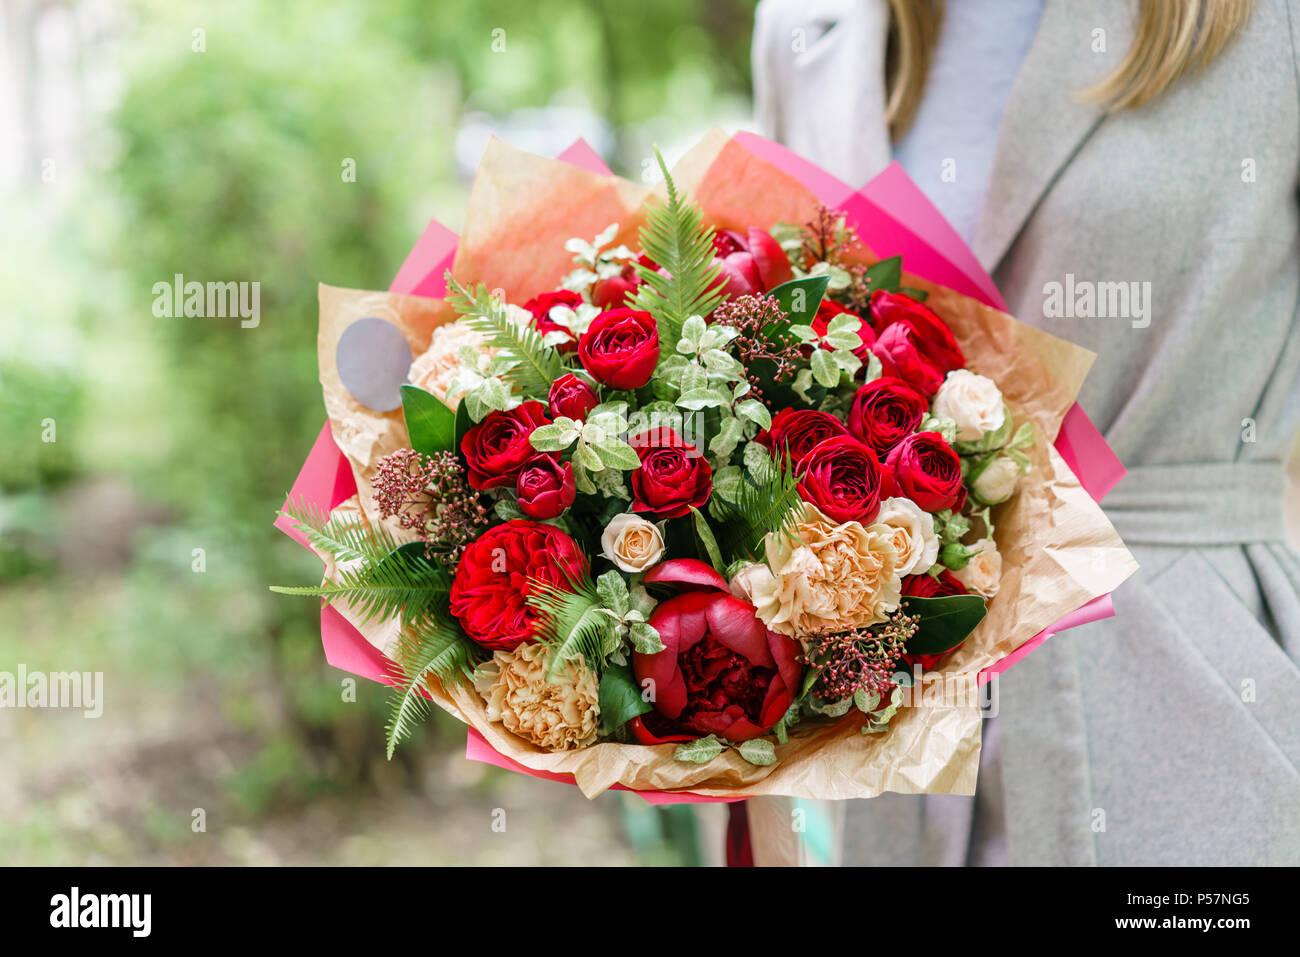 Young Girl Holding A Beautiful Spring Bouquet Flower Arrangement